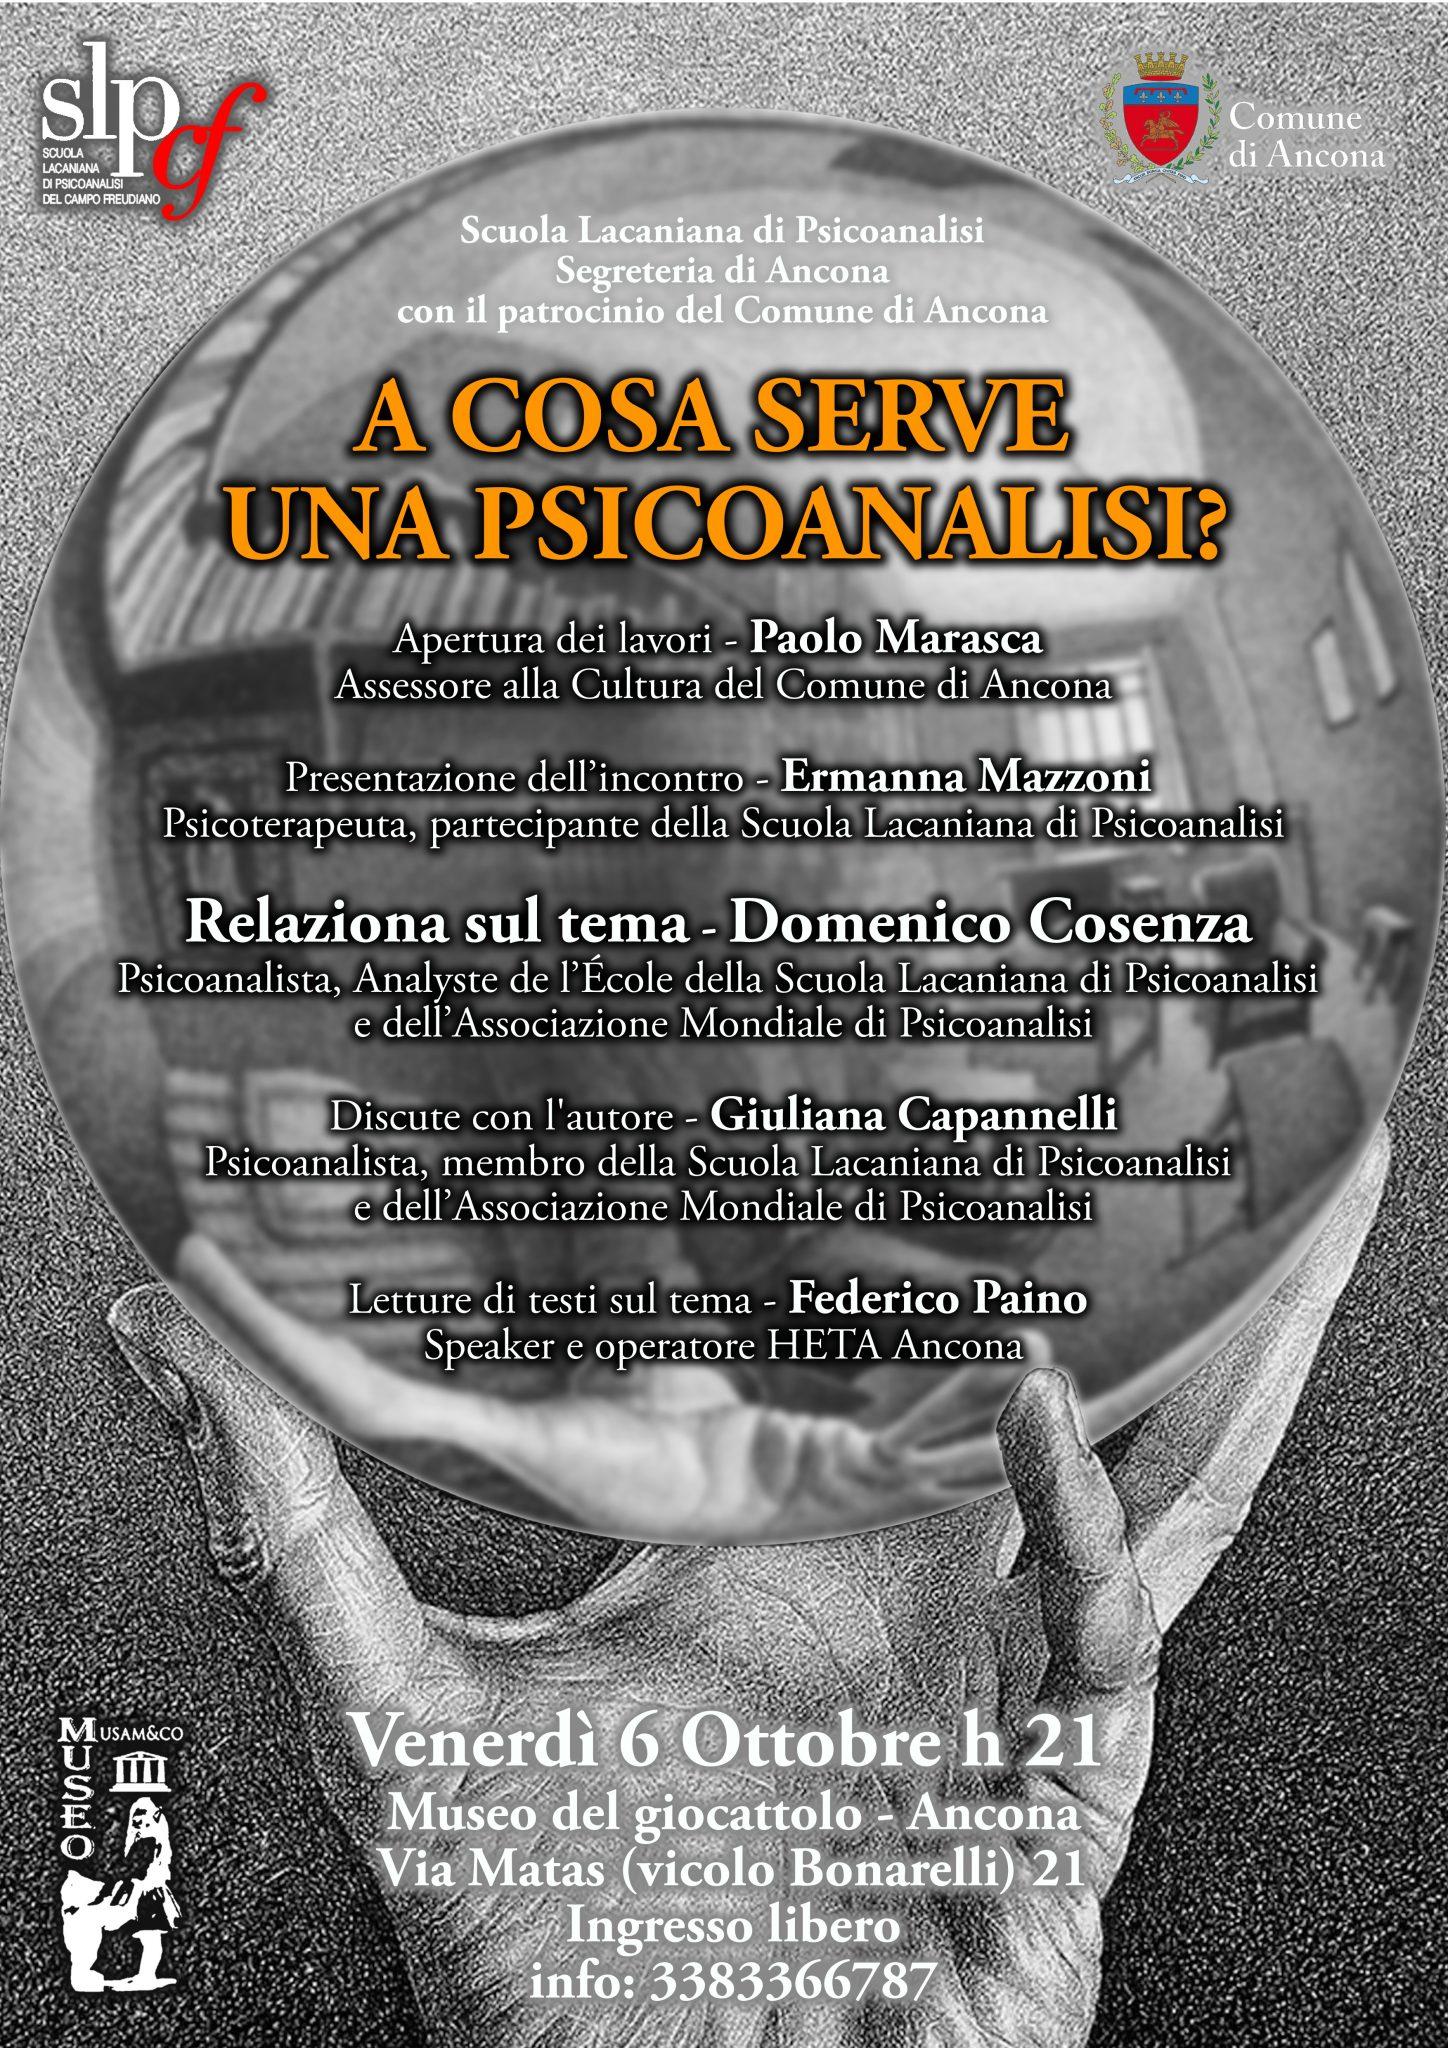 A cosa serve una psicoanalisi?